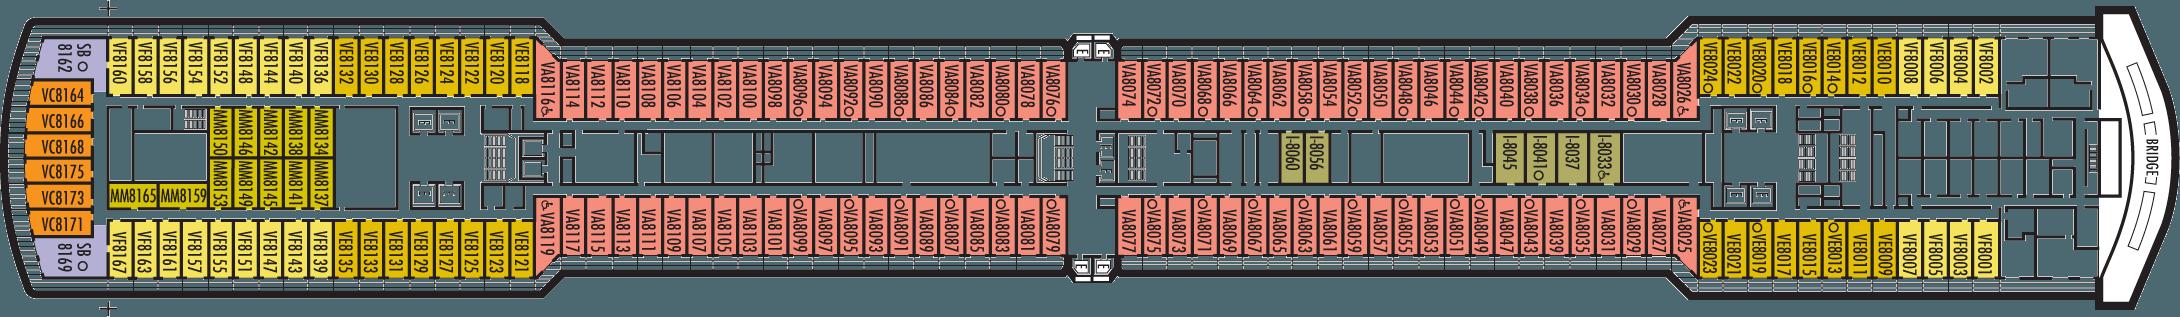 Navigation Deck